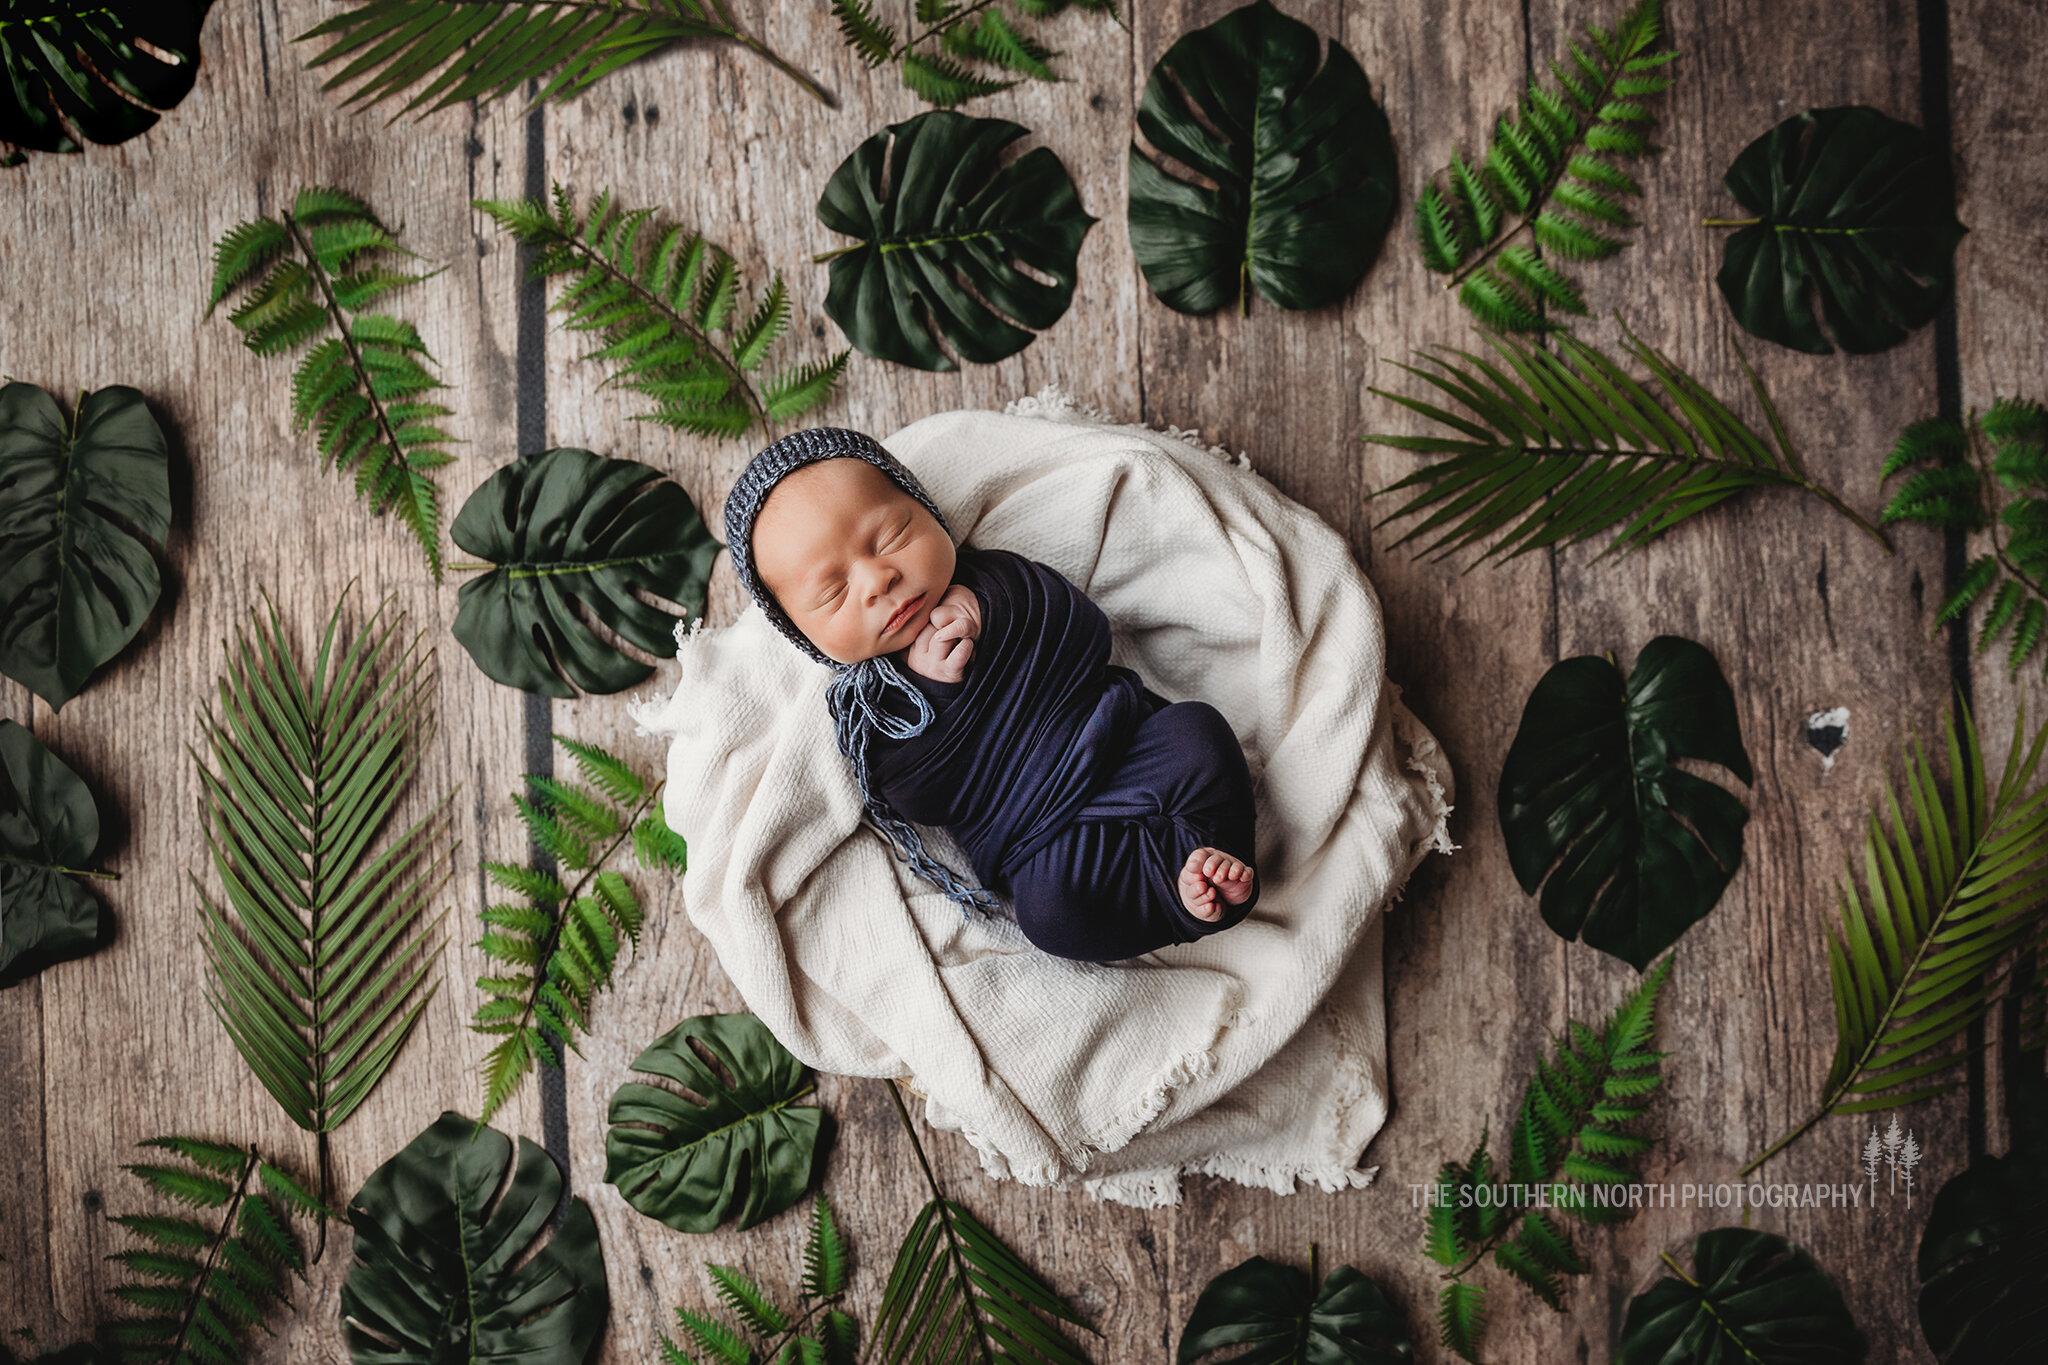 newborn-photography-austin-mn-minnesota-family-kids-photo-session-albert-lea-mn-rochester-mn-southern-minnesota-photographer-birth-photography-baby-fresh-48